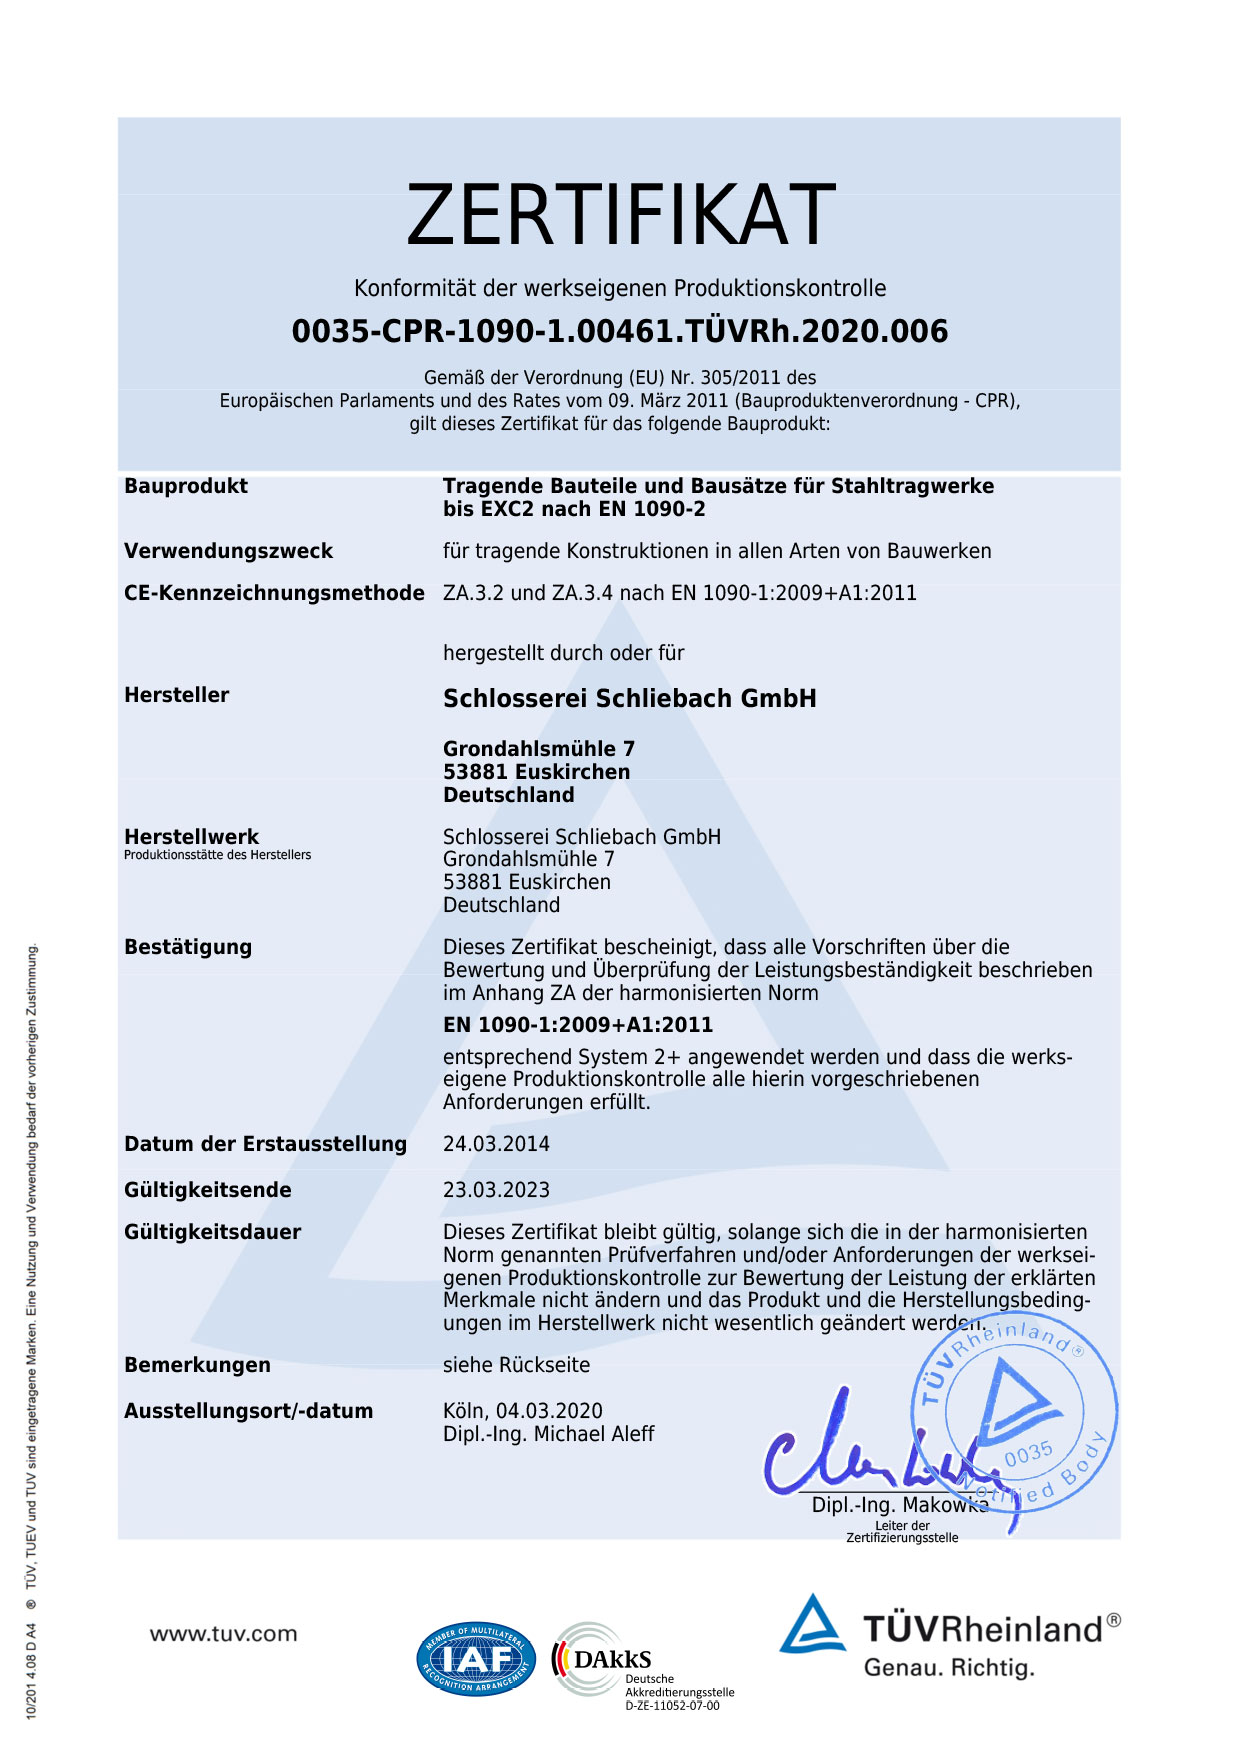 zertifikat-2020-001-1 - Zertifikate